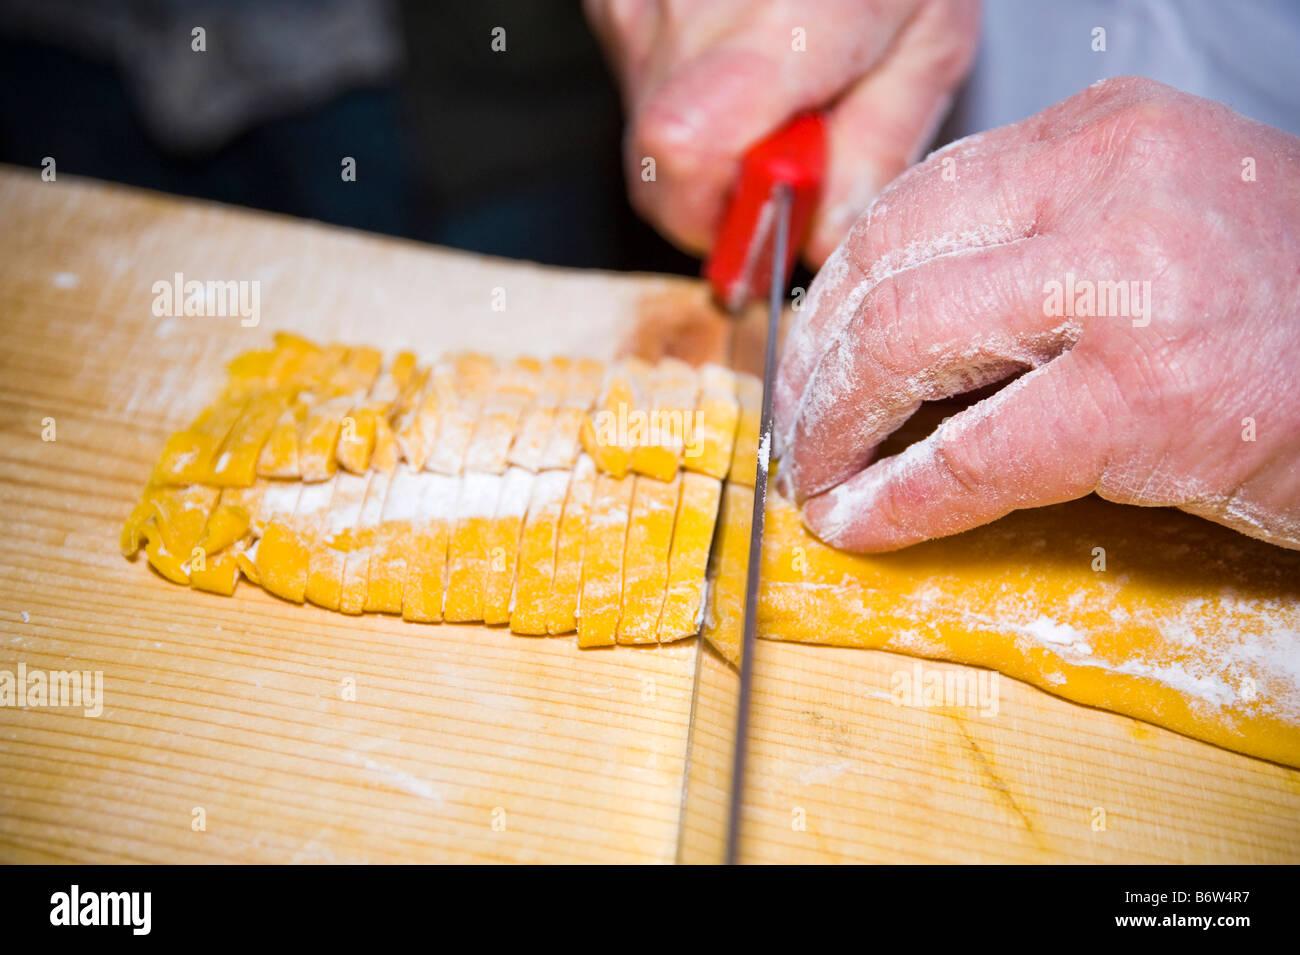 Cutting handmade fettuccine, close-up. - Stock Image